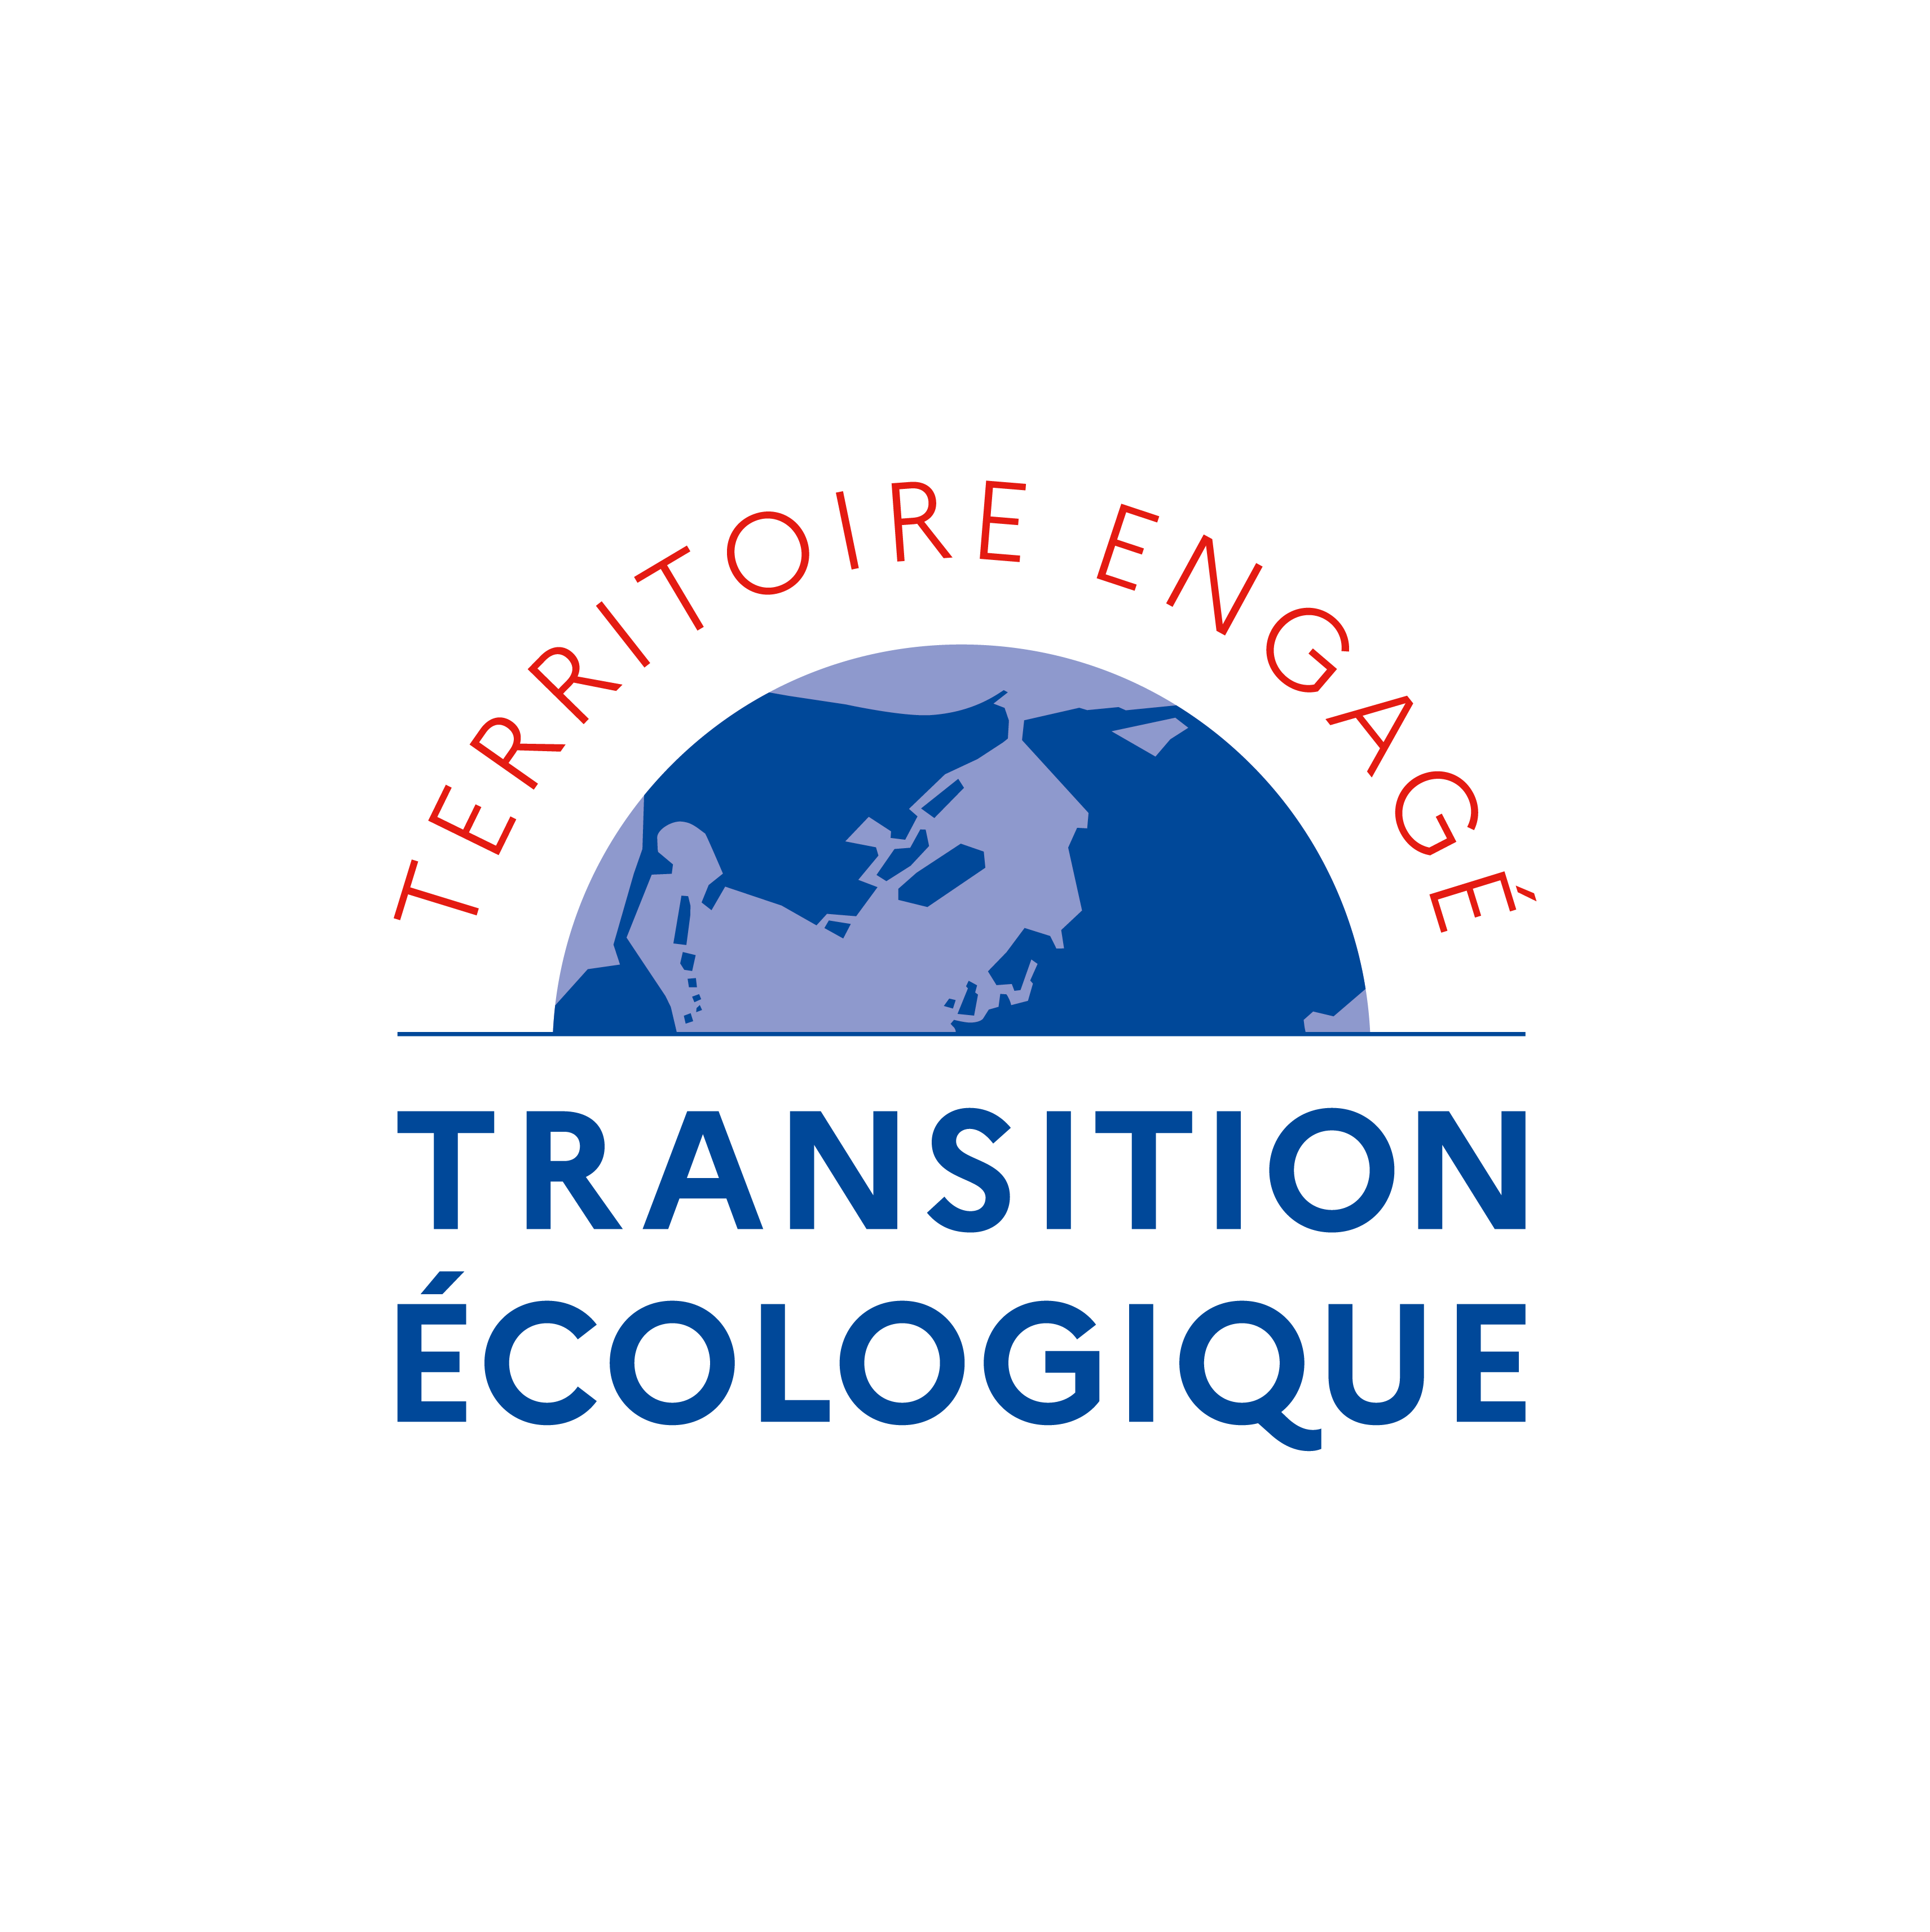 https://territoireengagetransitionecologique.ademe.fr/wp-content/uploads/2021/07/Territoire_Engage_TE_Seul.png